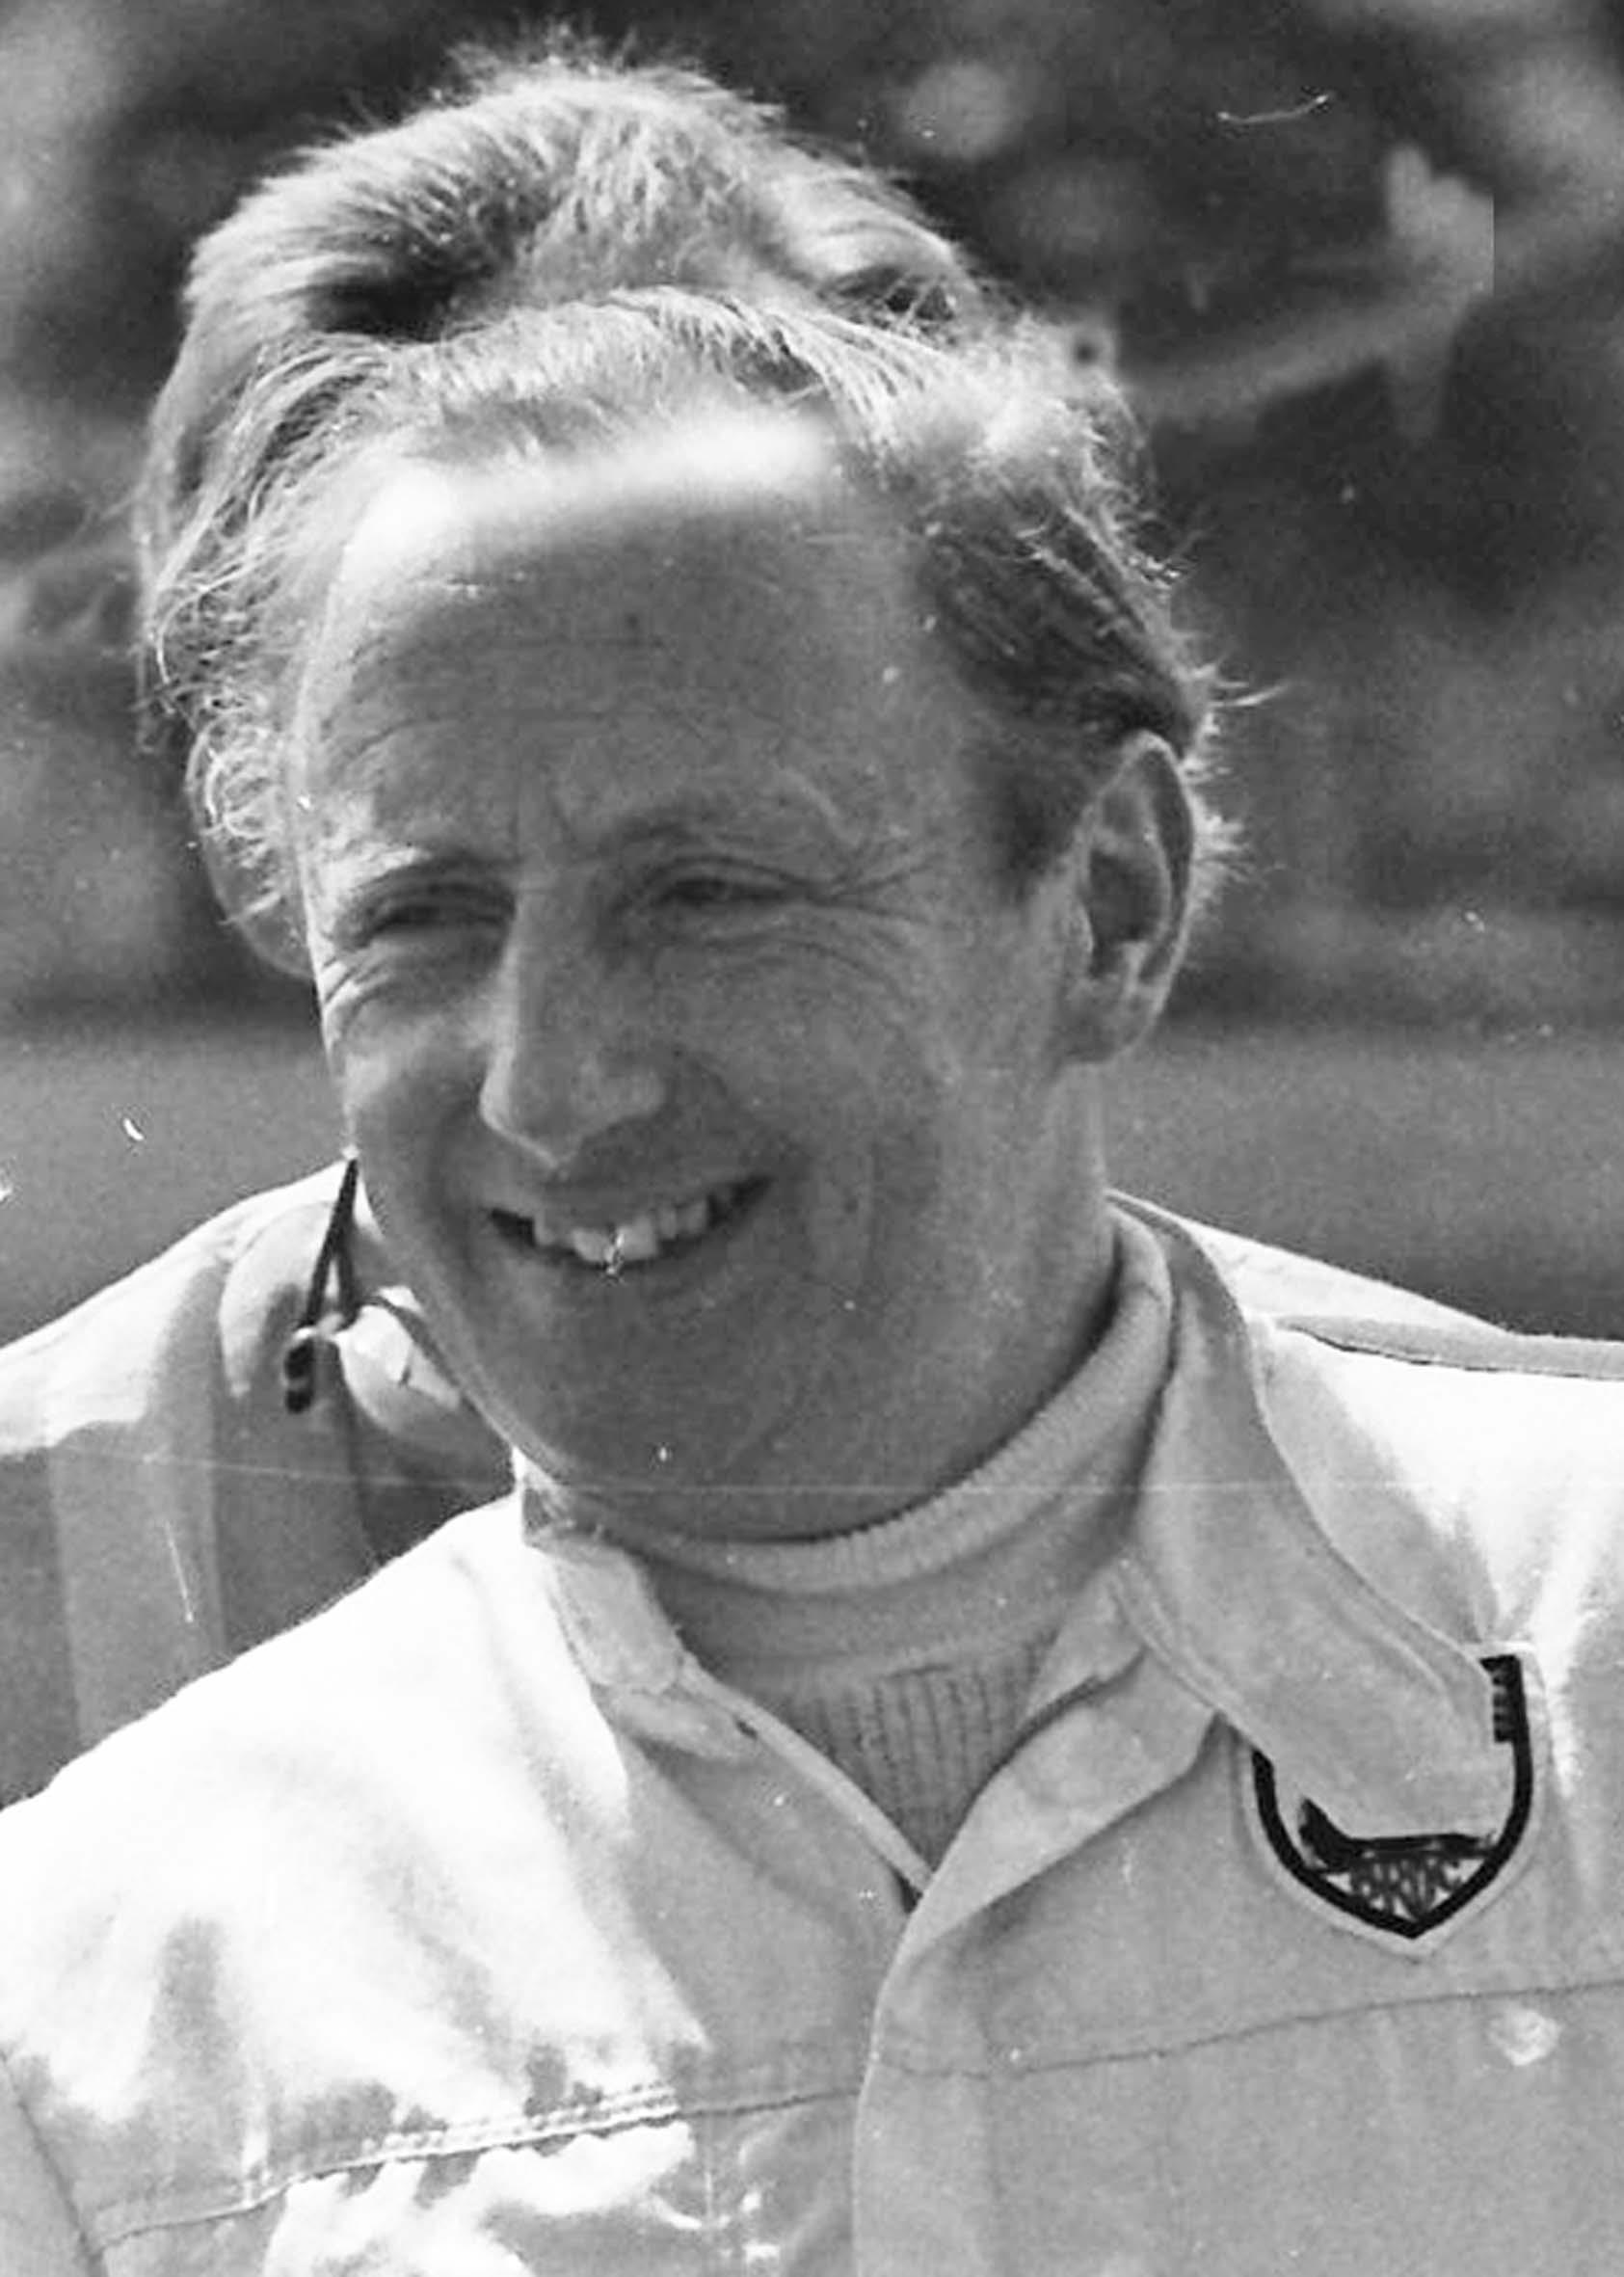 Michael MacDowel